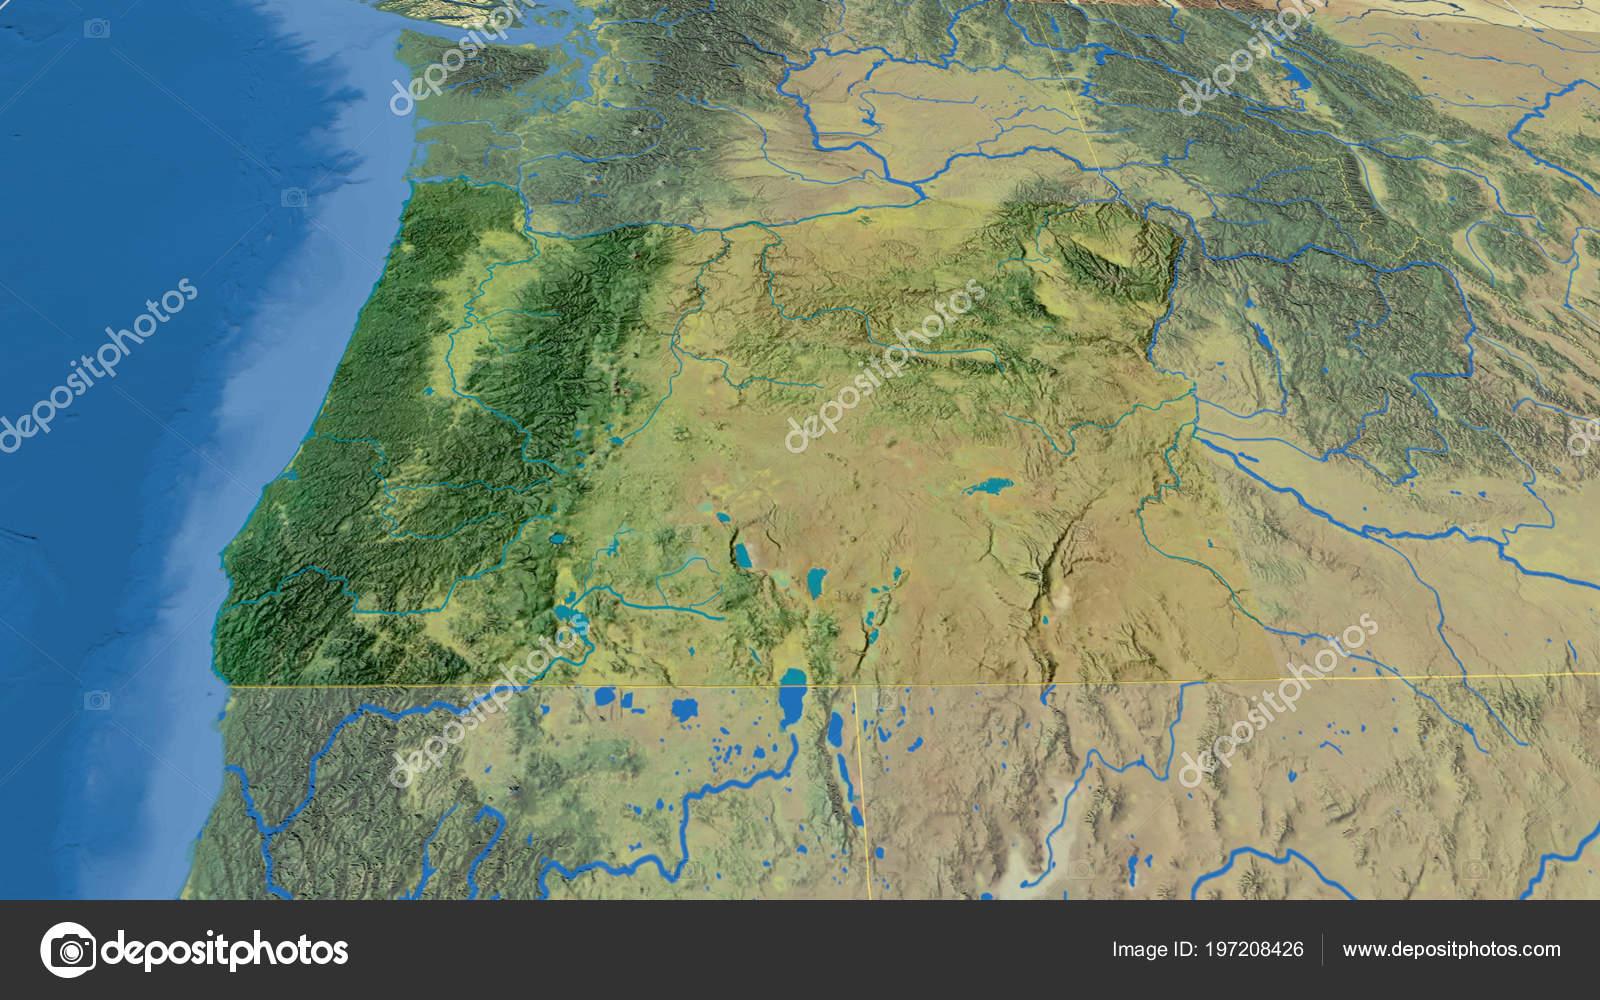 Oregon Region United States Extruded Topographic Map Stock Photo